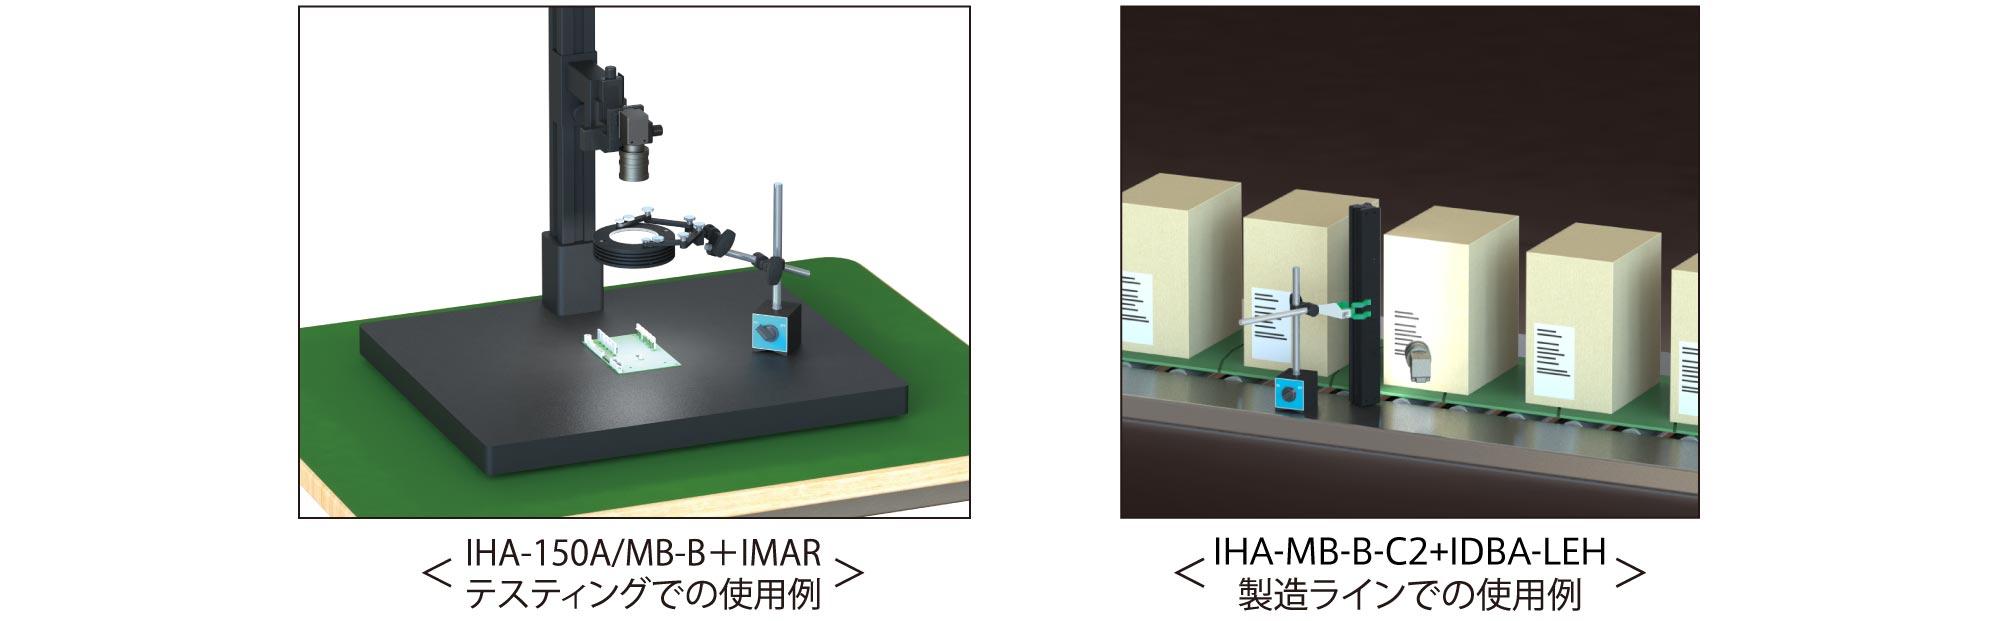 IHA-150A/MB-B